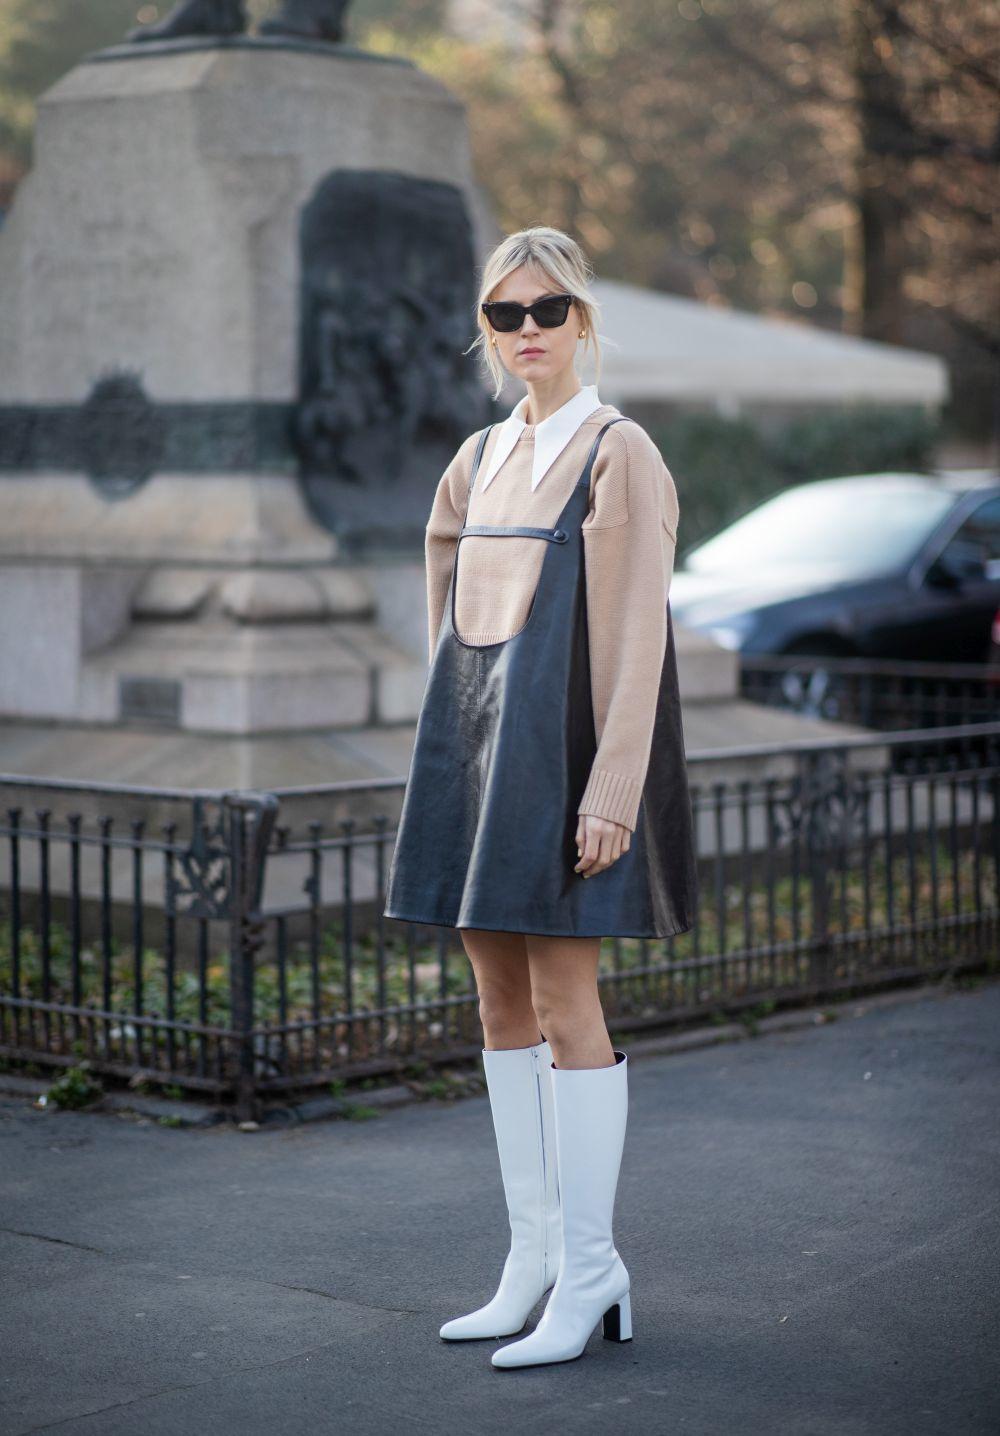 Linda Tol con vestido mini.